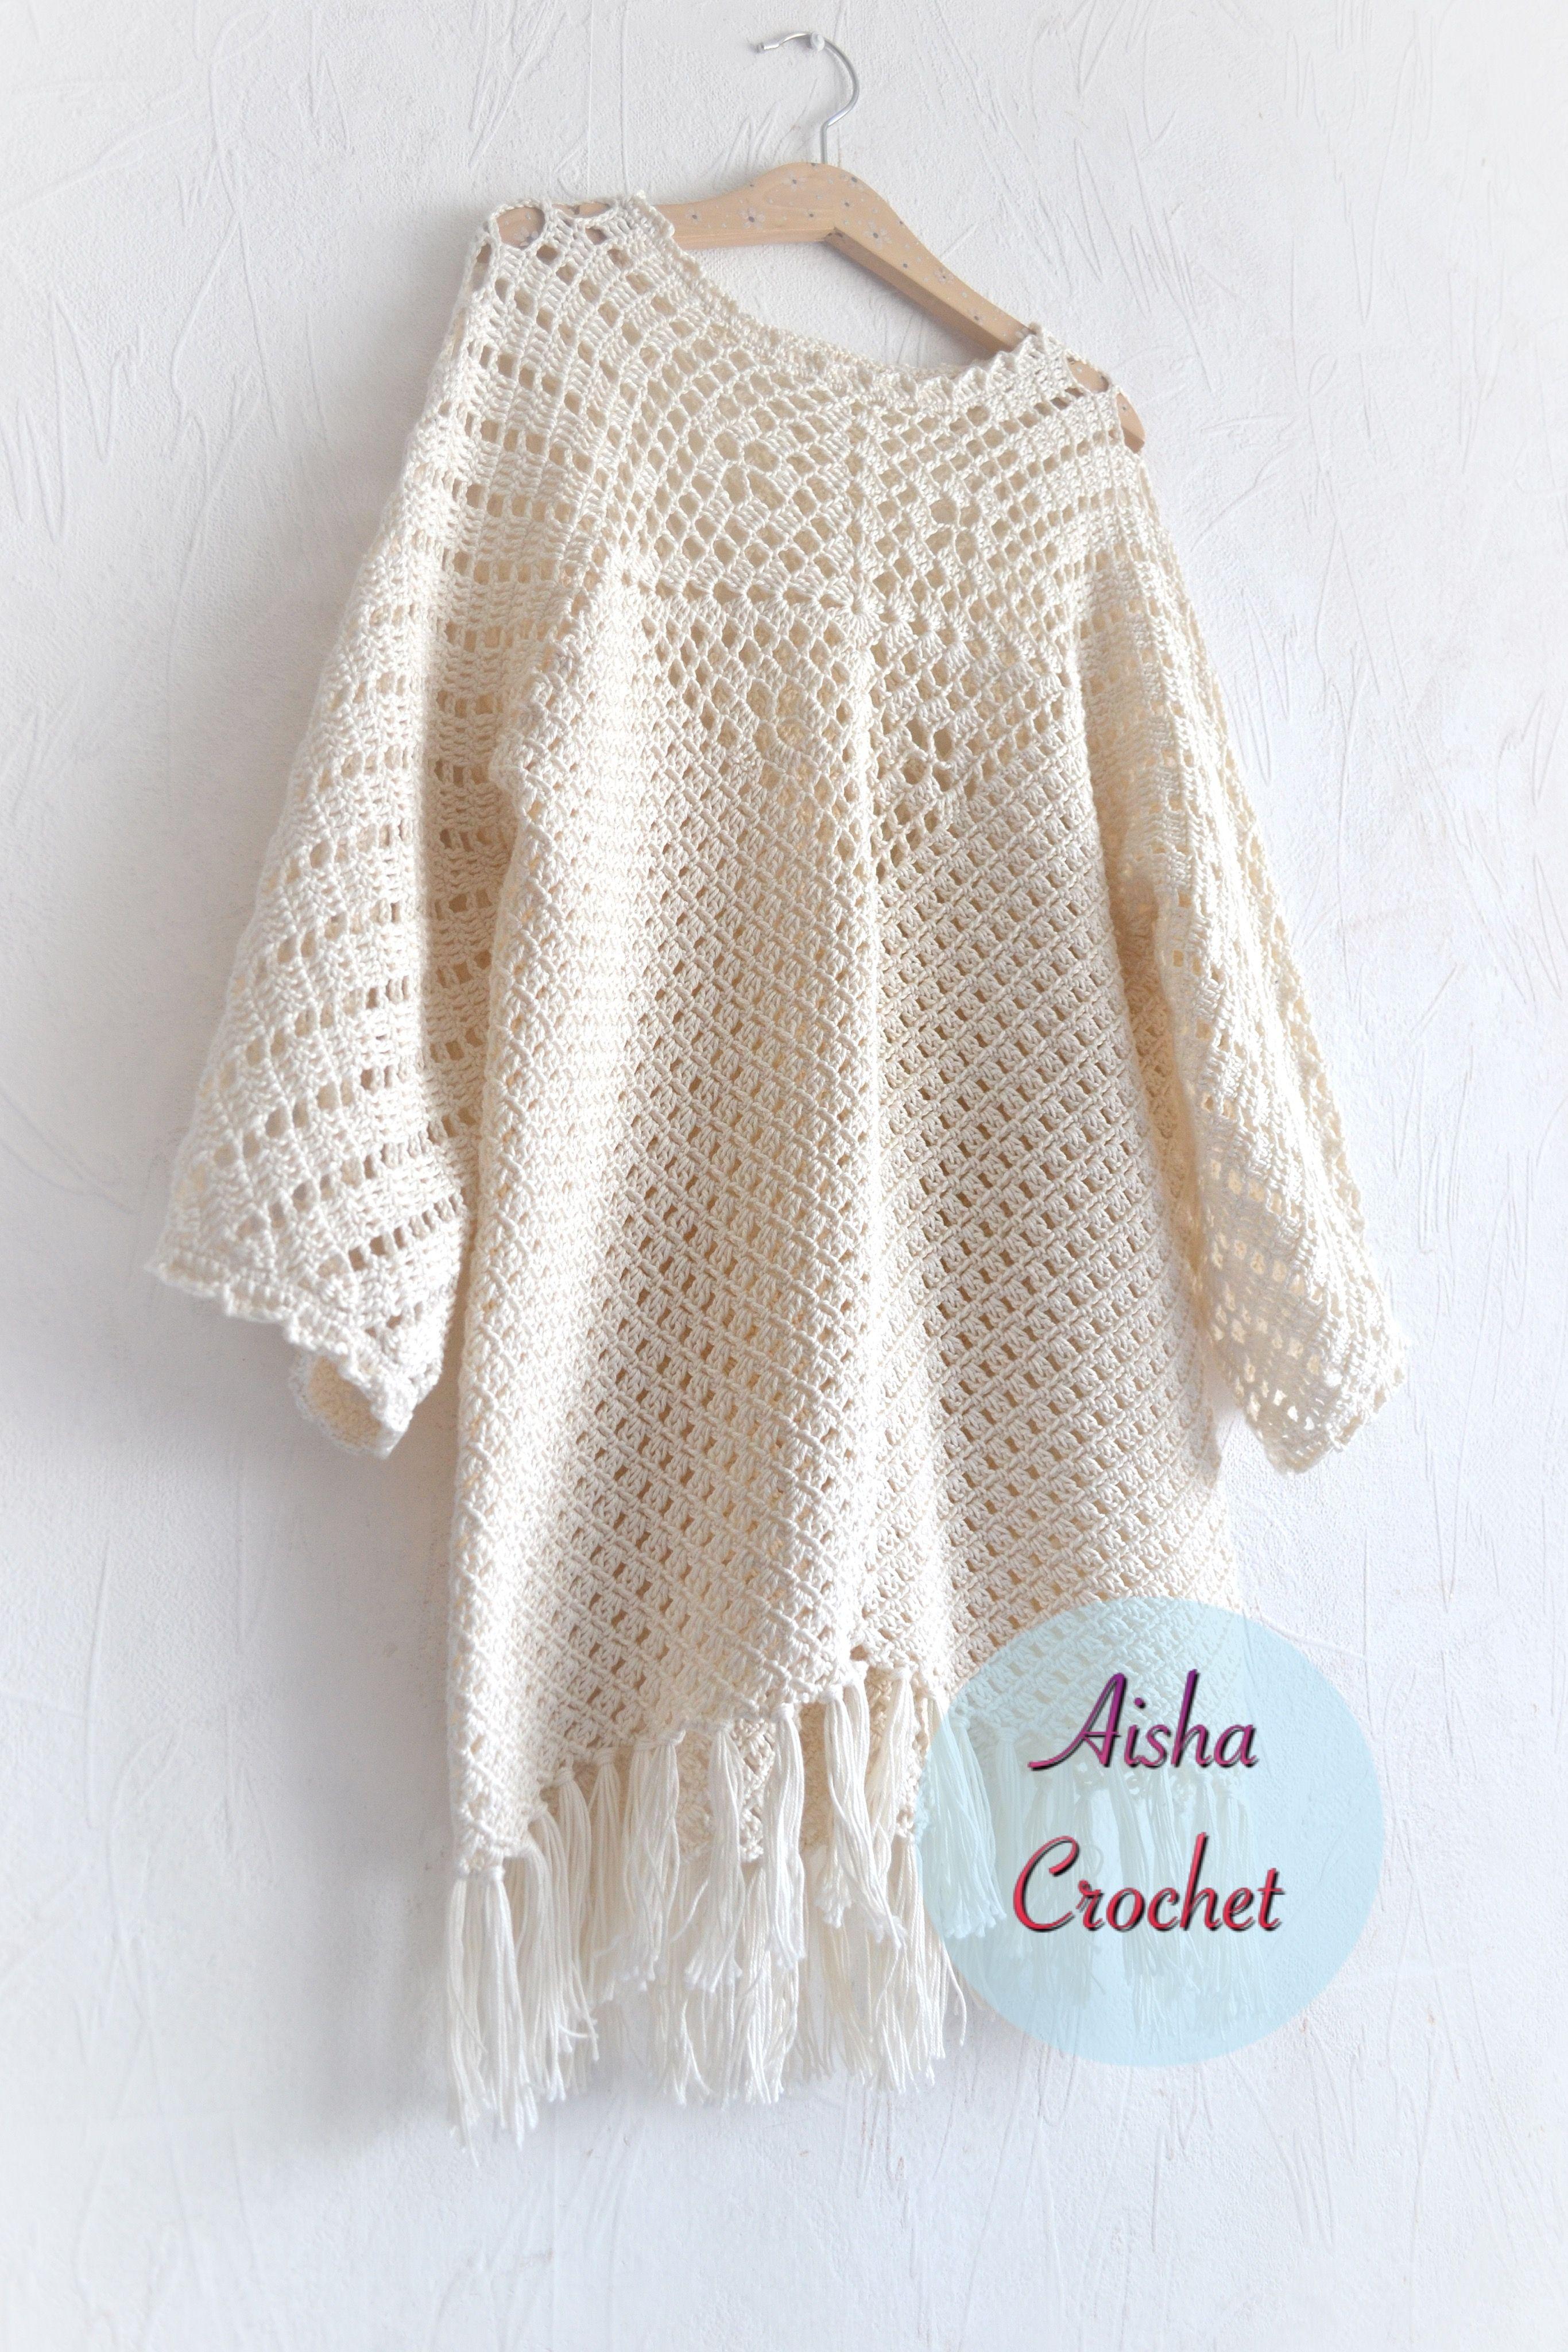 Crochet tunic by Aisha Crochet | Crochet | Pinterest | Blusas